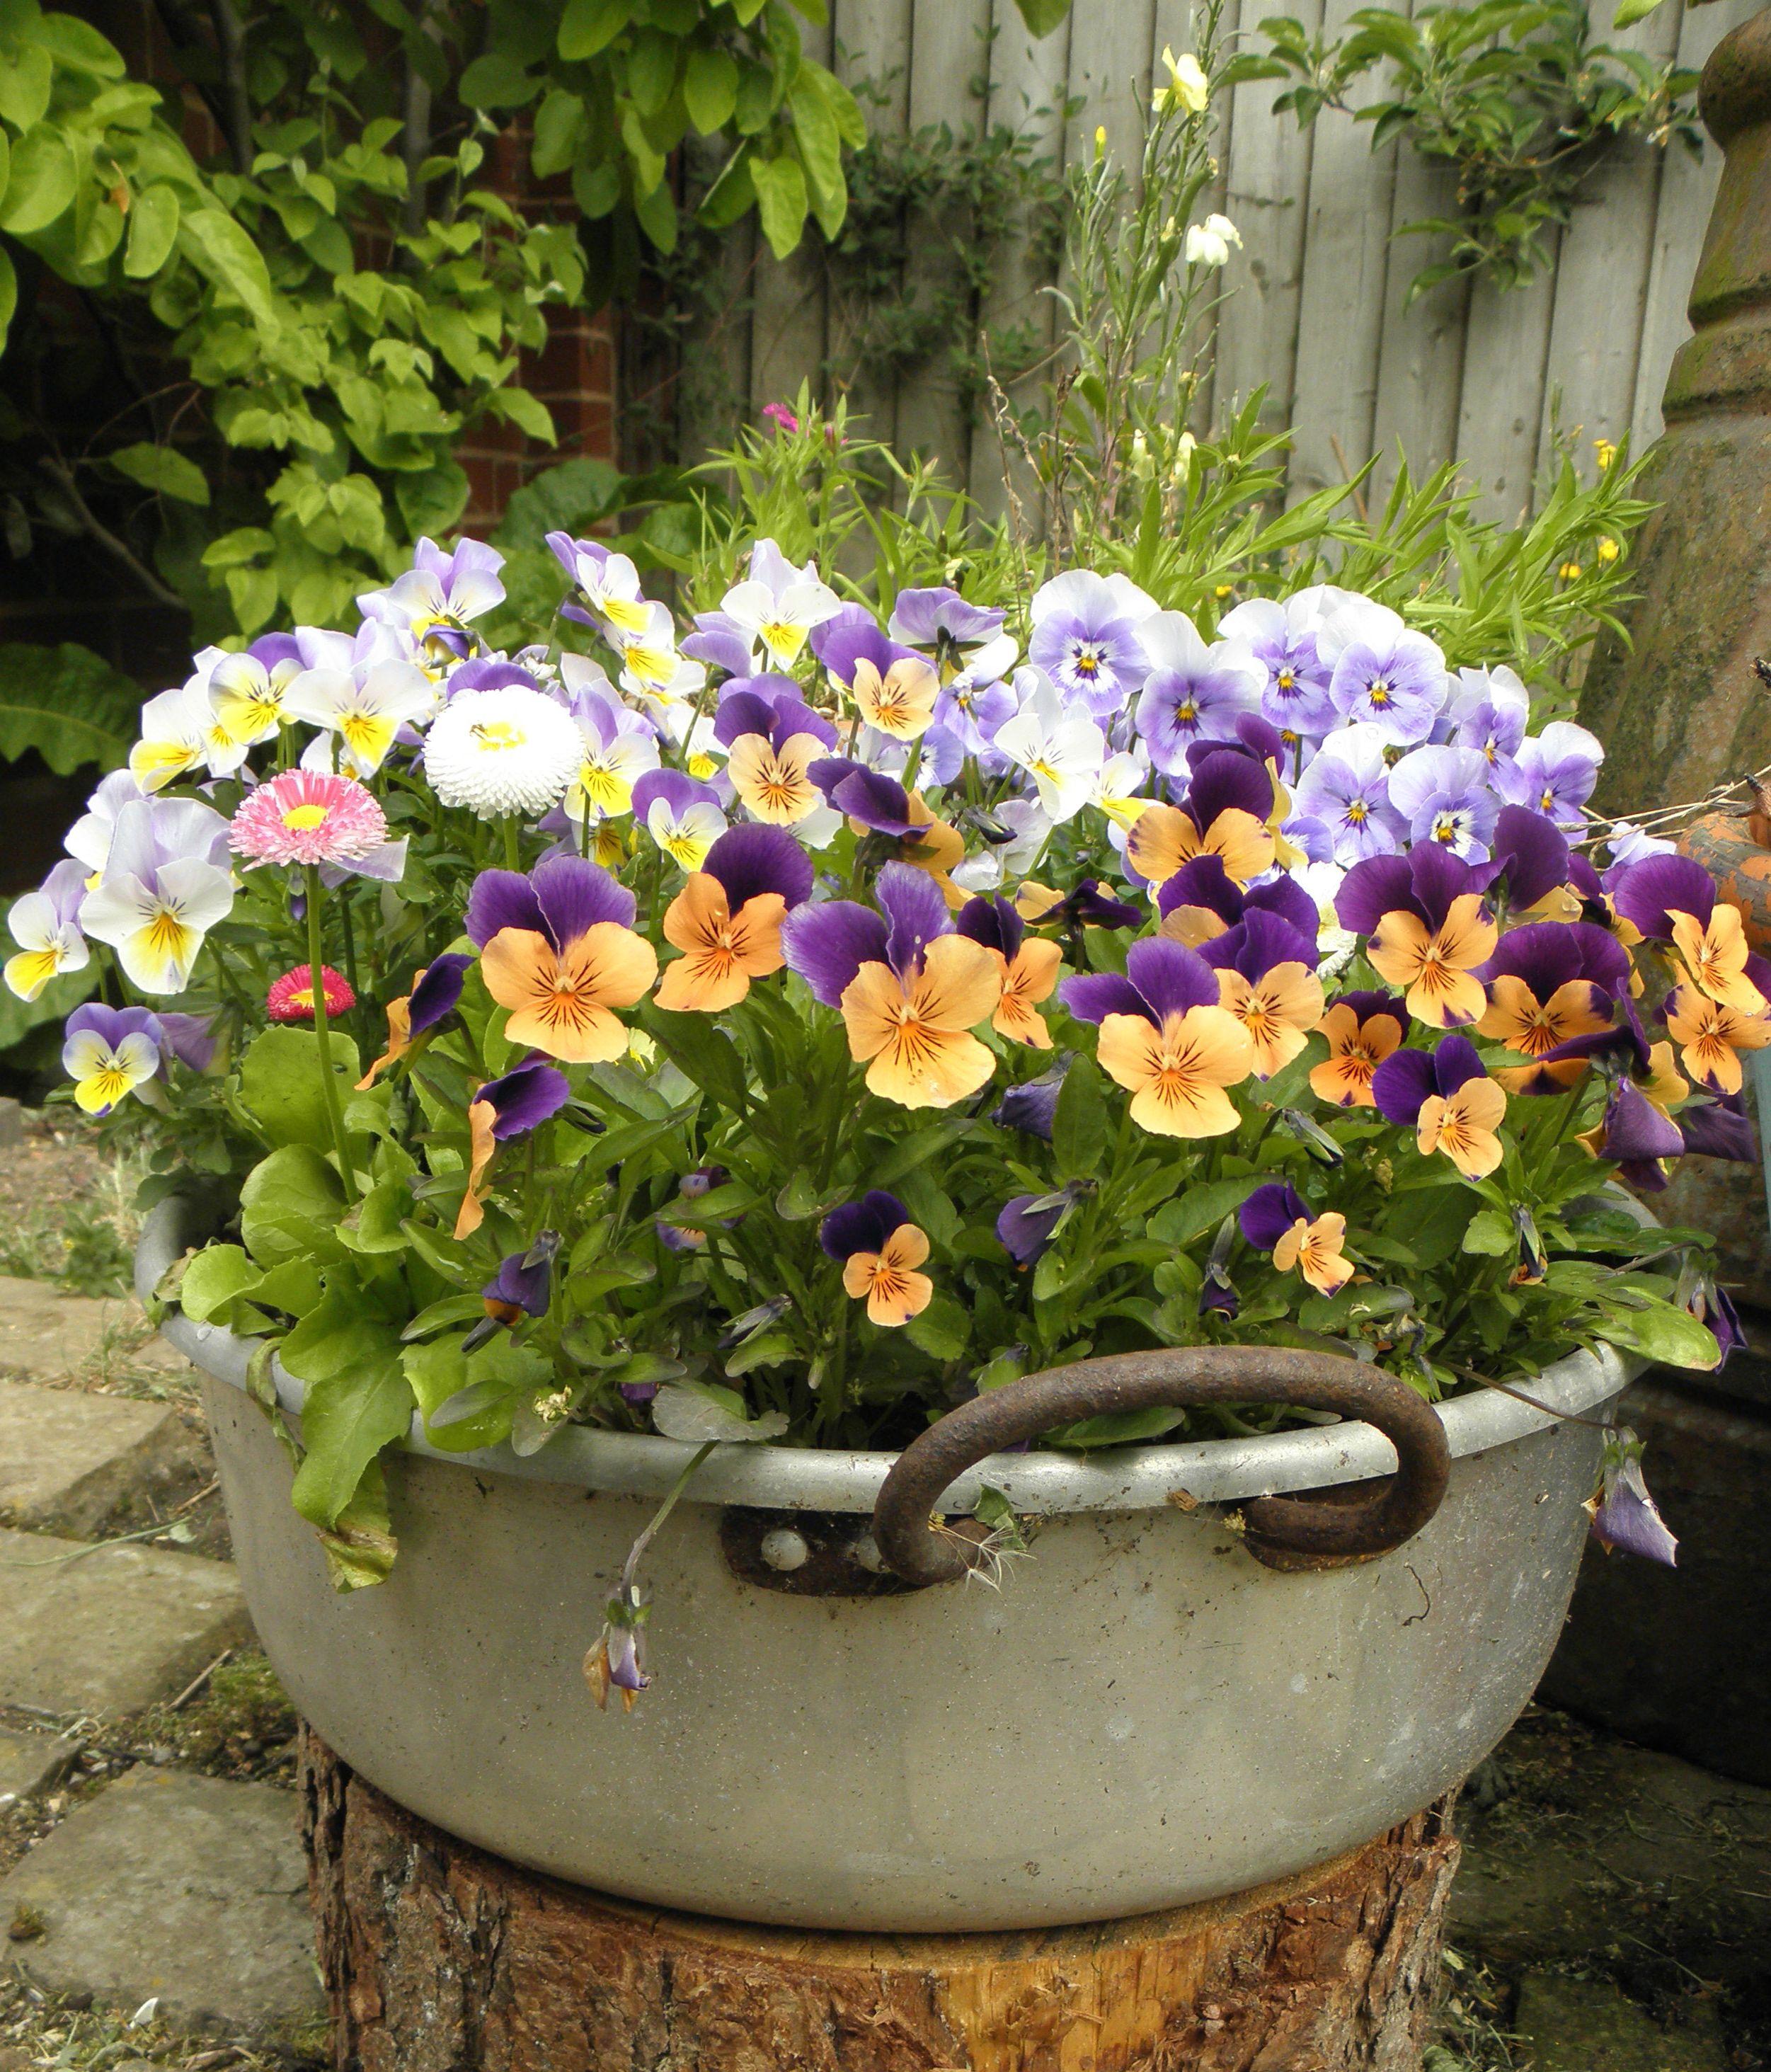 Little Pot of Pansies